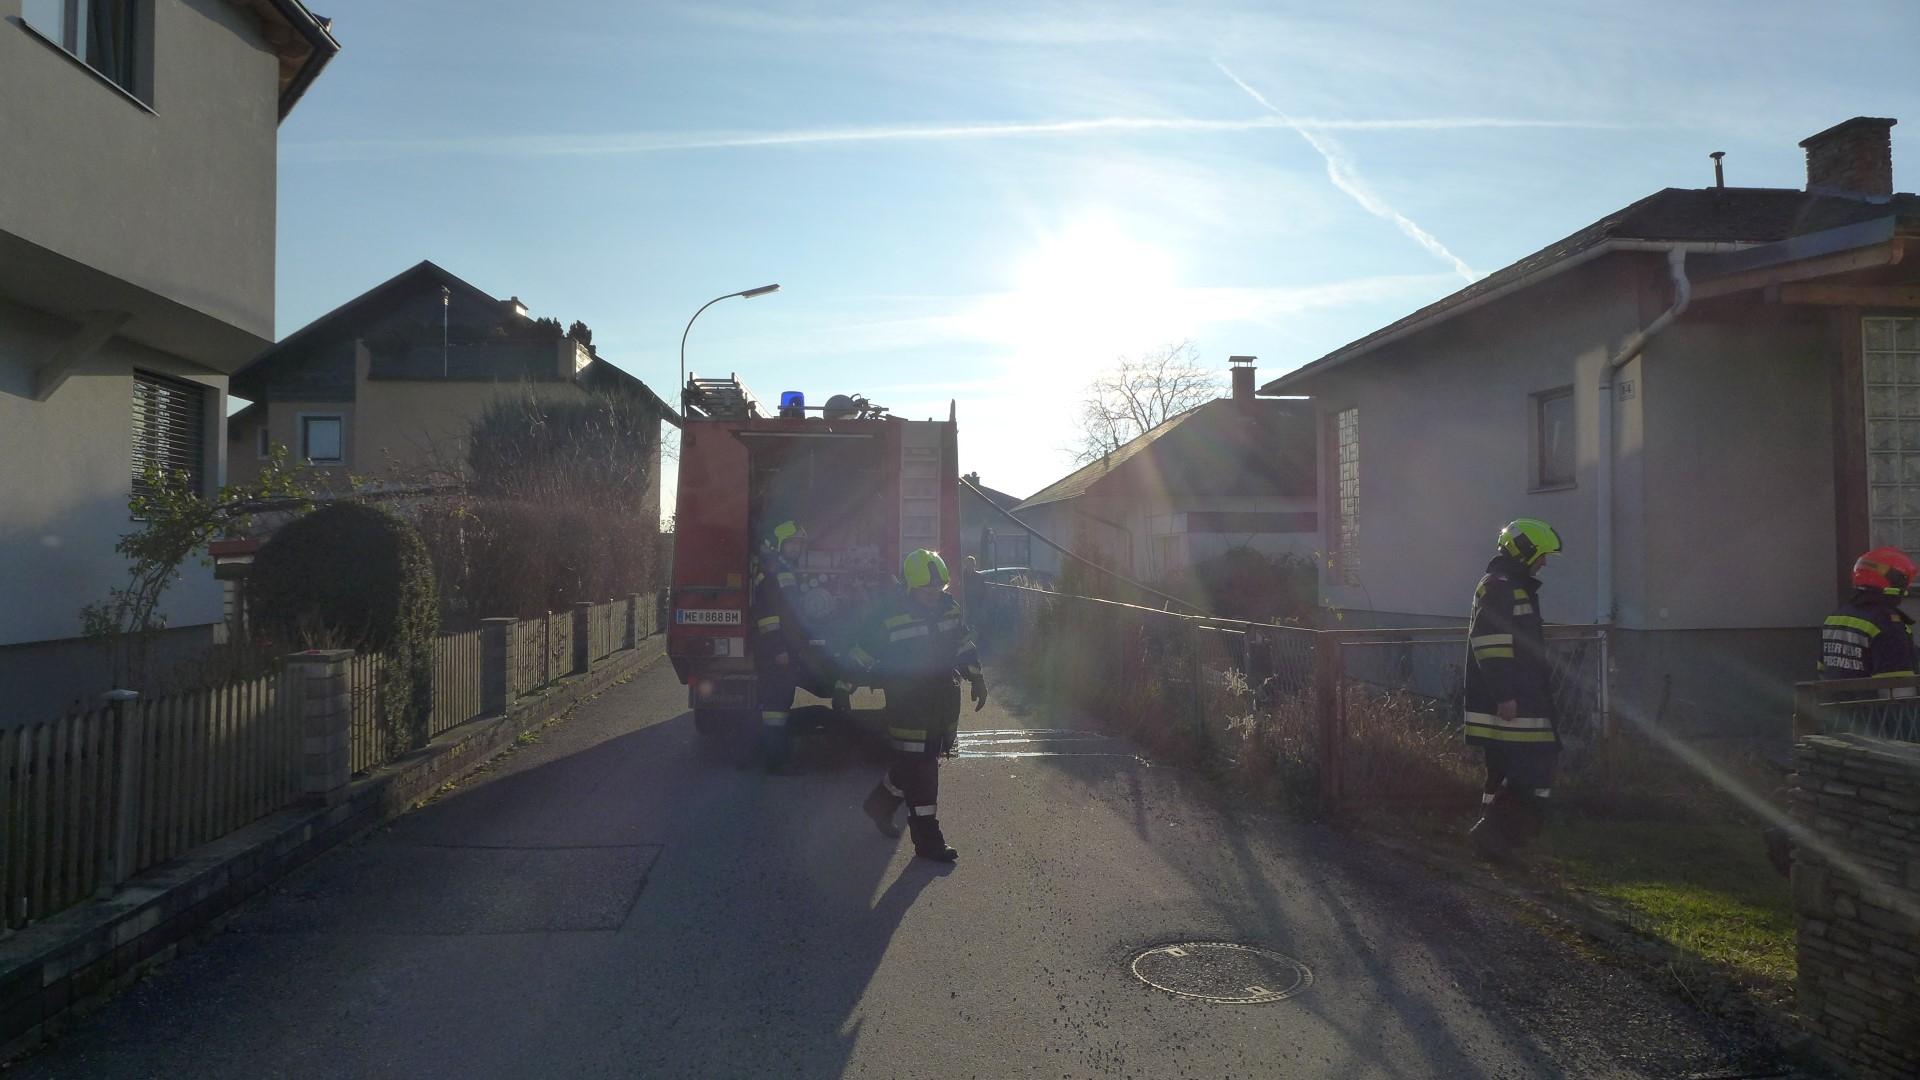 2017.12.25. Heckenbrand-Flurbrand Kinostraße (2)